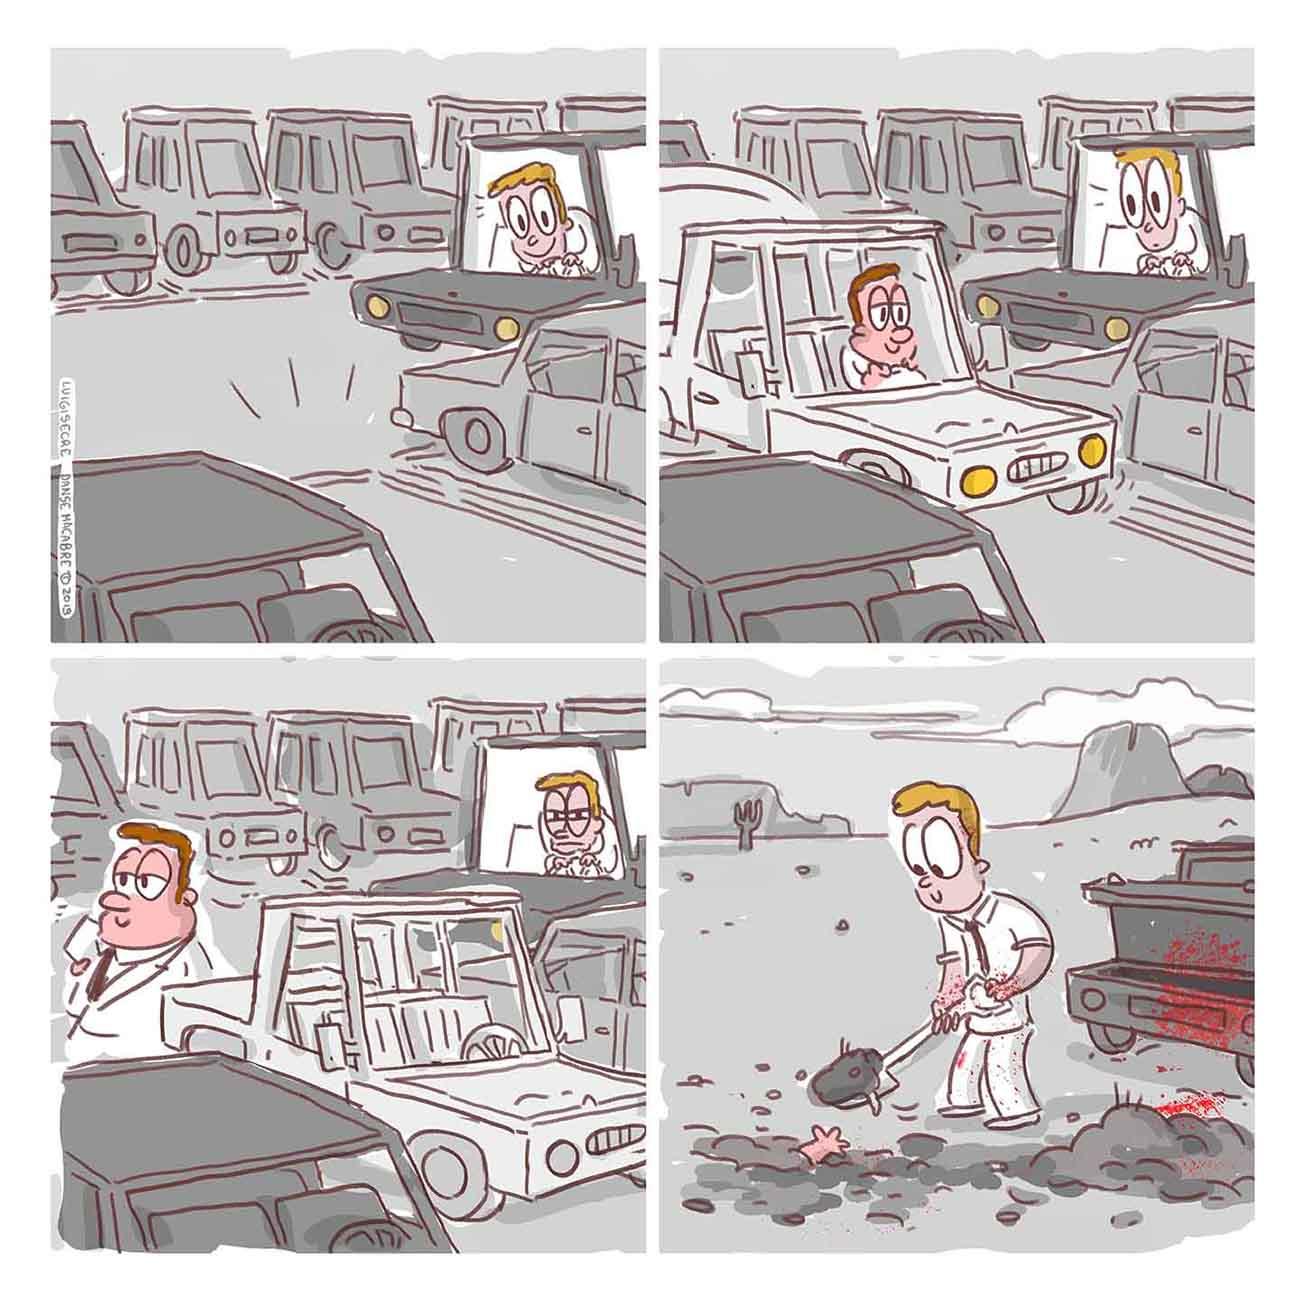 Contenuti_Low_Res_Luigi_Segre_Cartoons_2019_Danse_Macabre_02.jpg